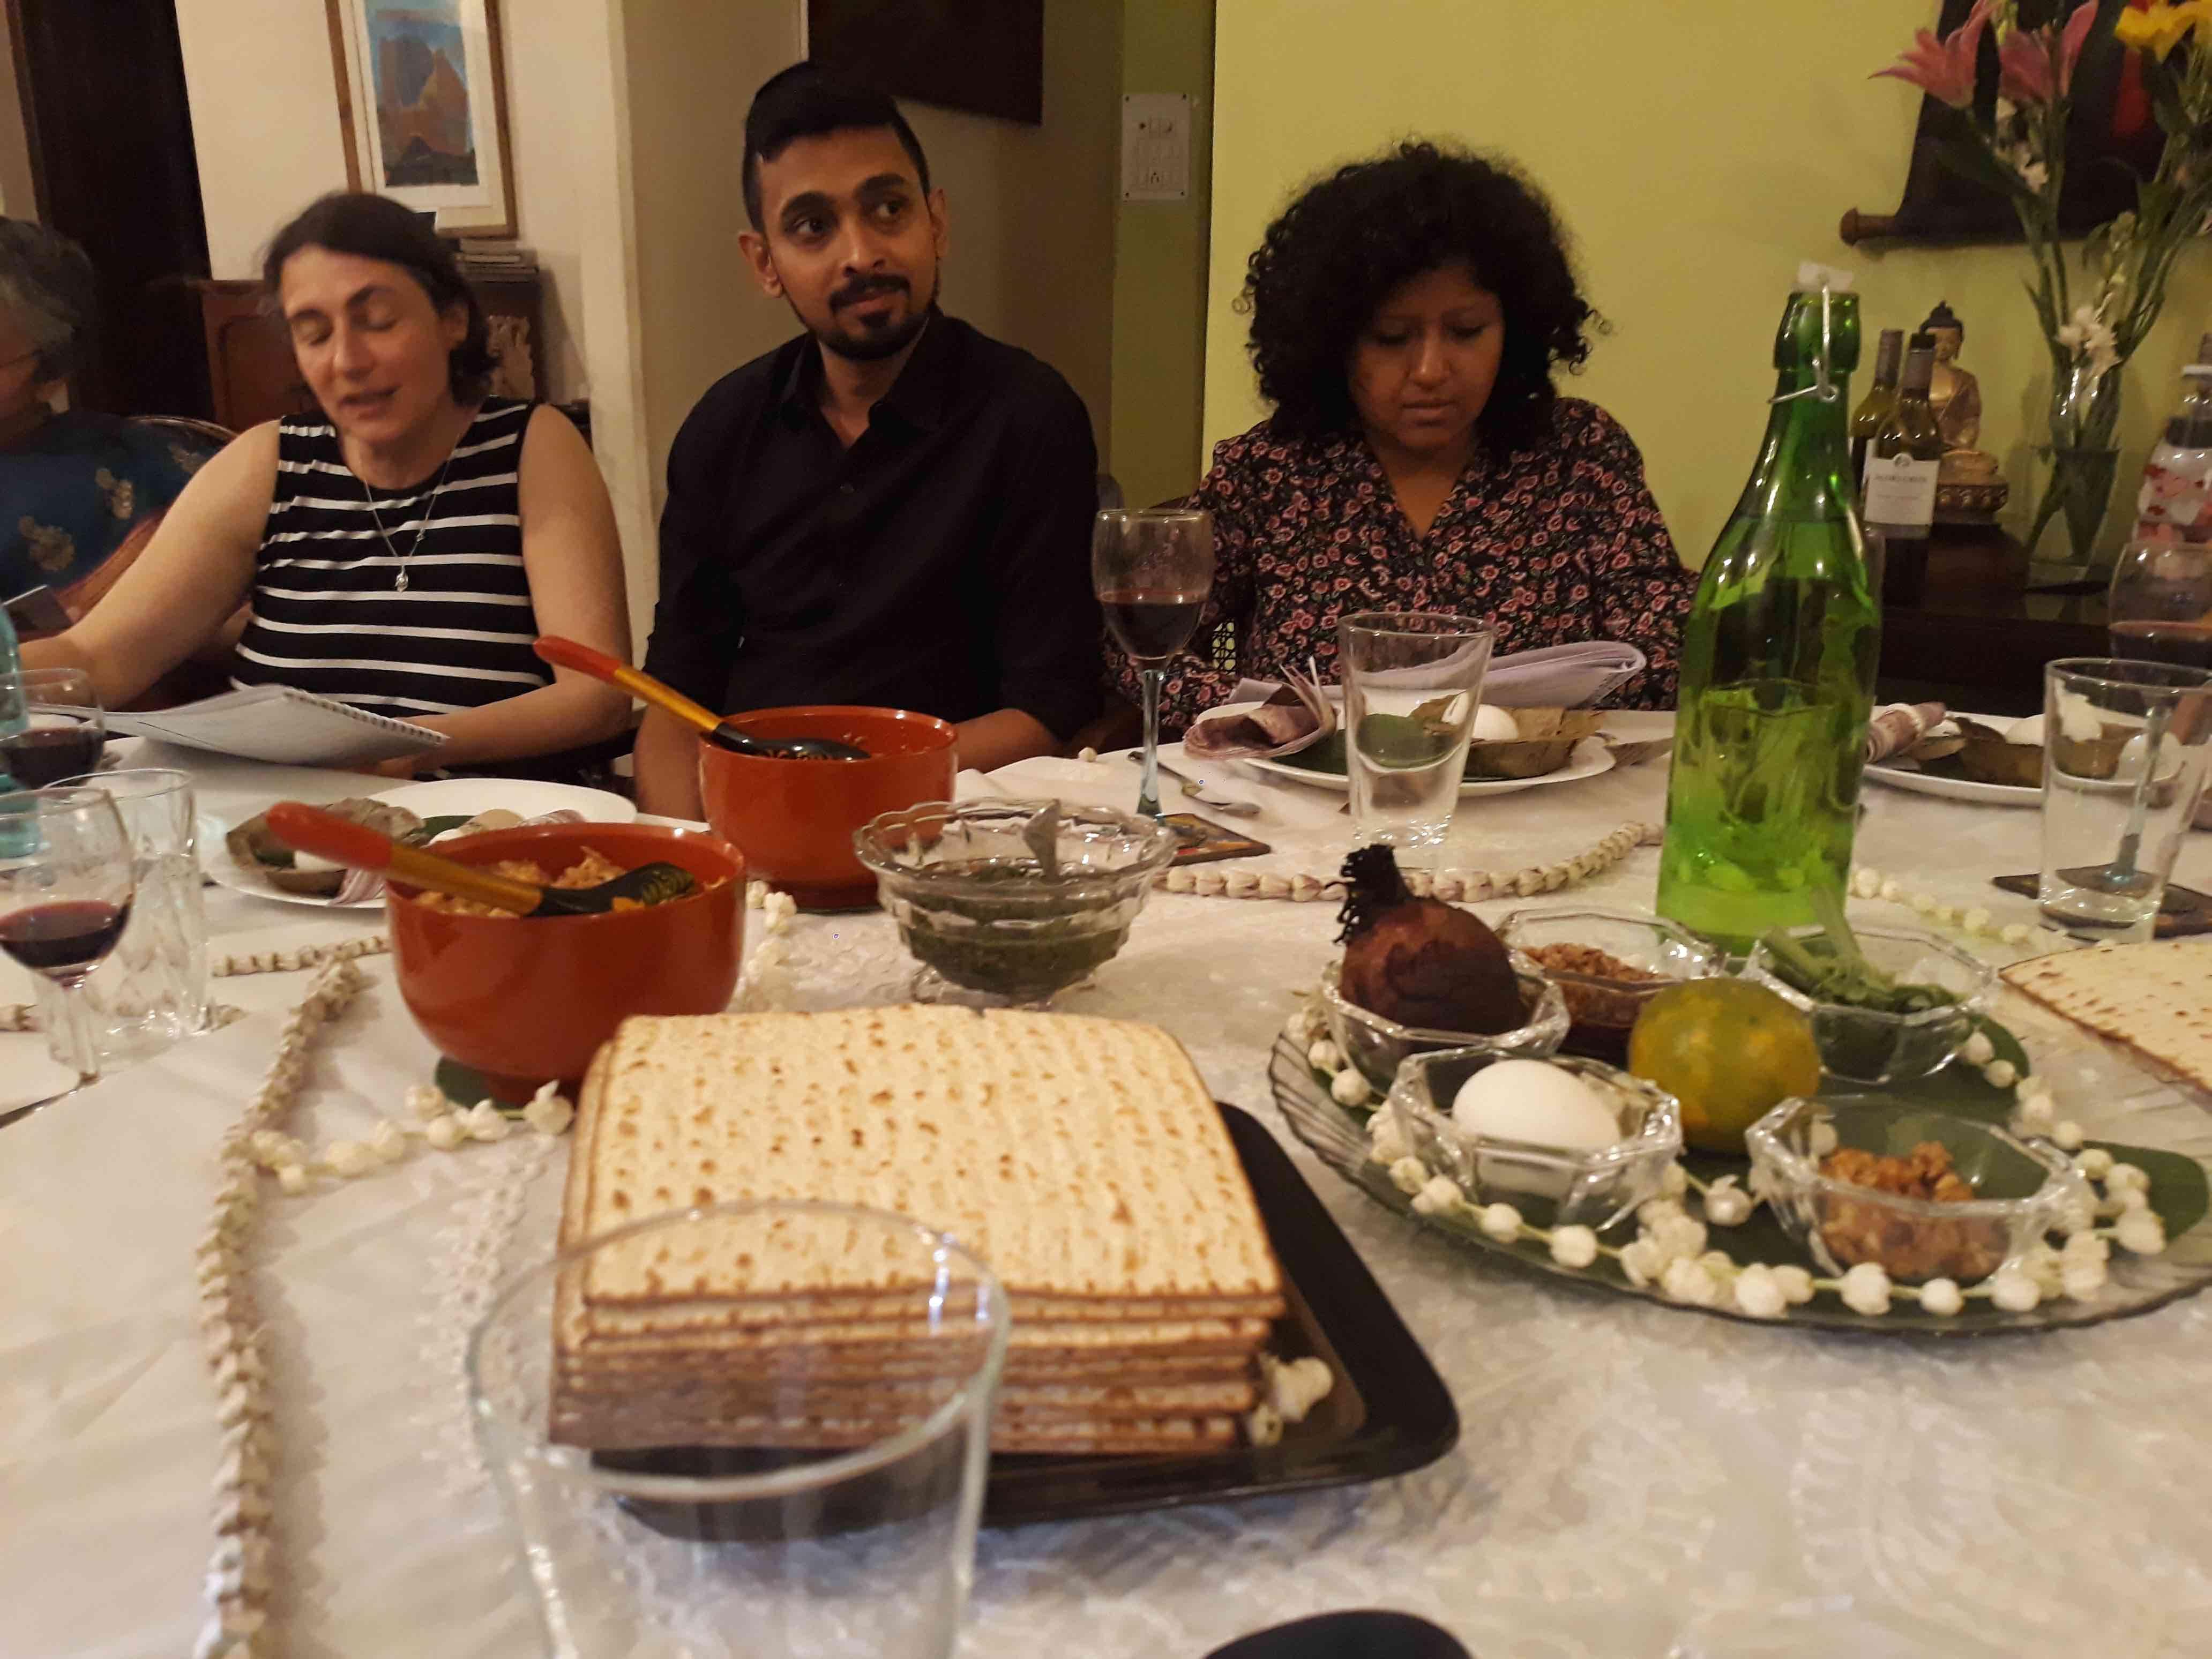 Caption: Seder plate